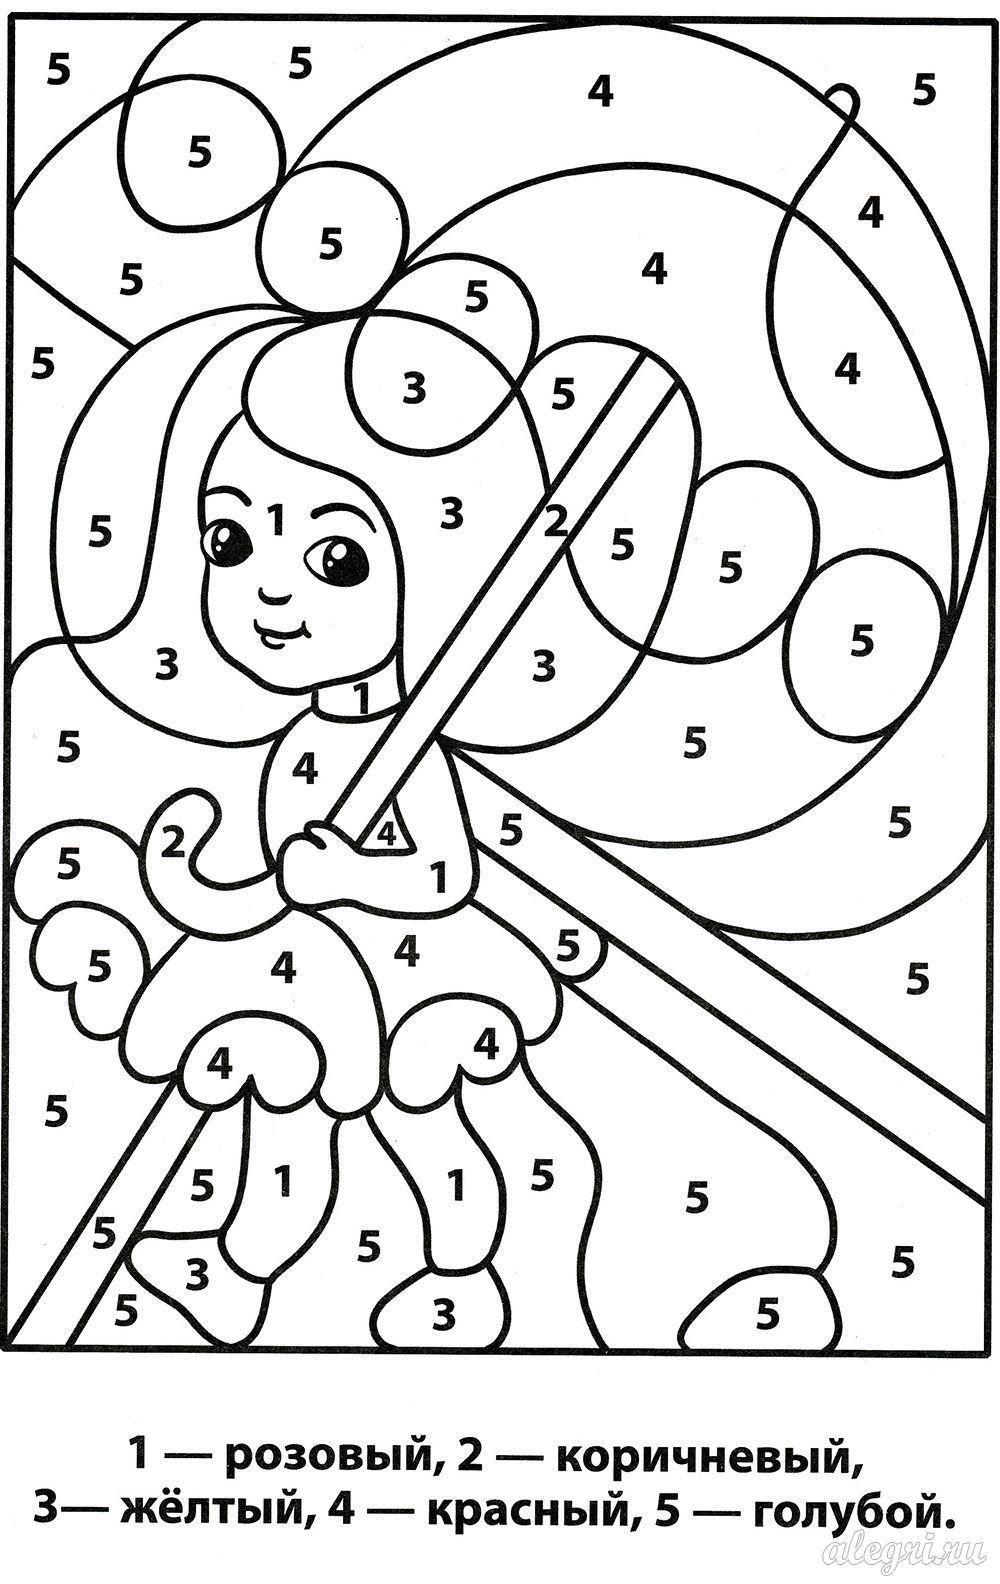 игры раскраска по цифрам для детей раскраска по цифрам раскраски раскраска по номерам